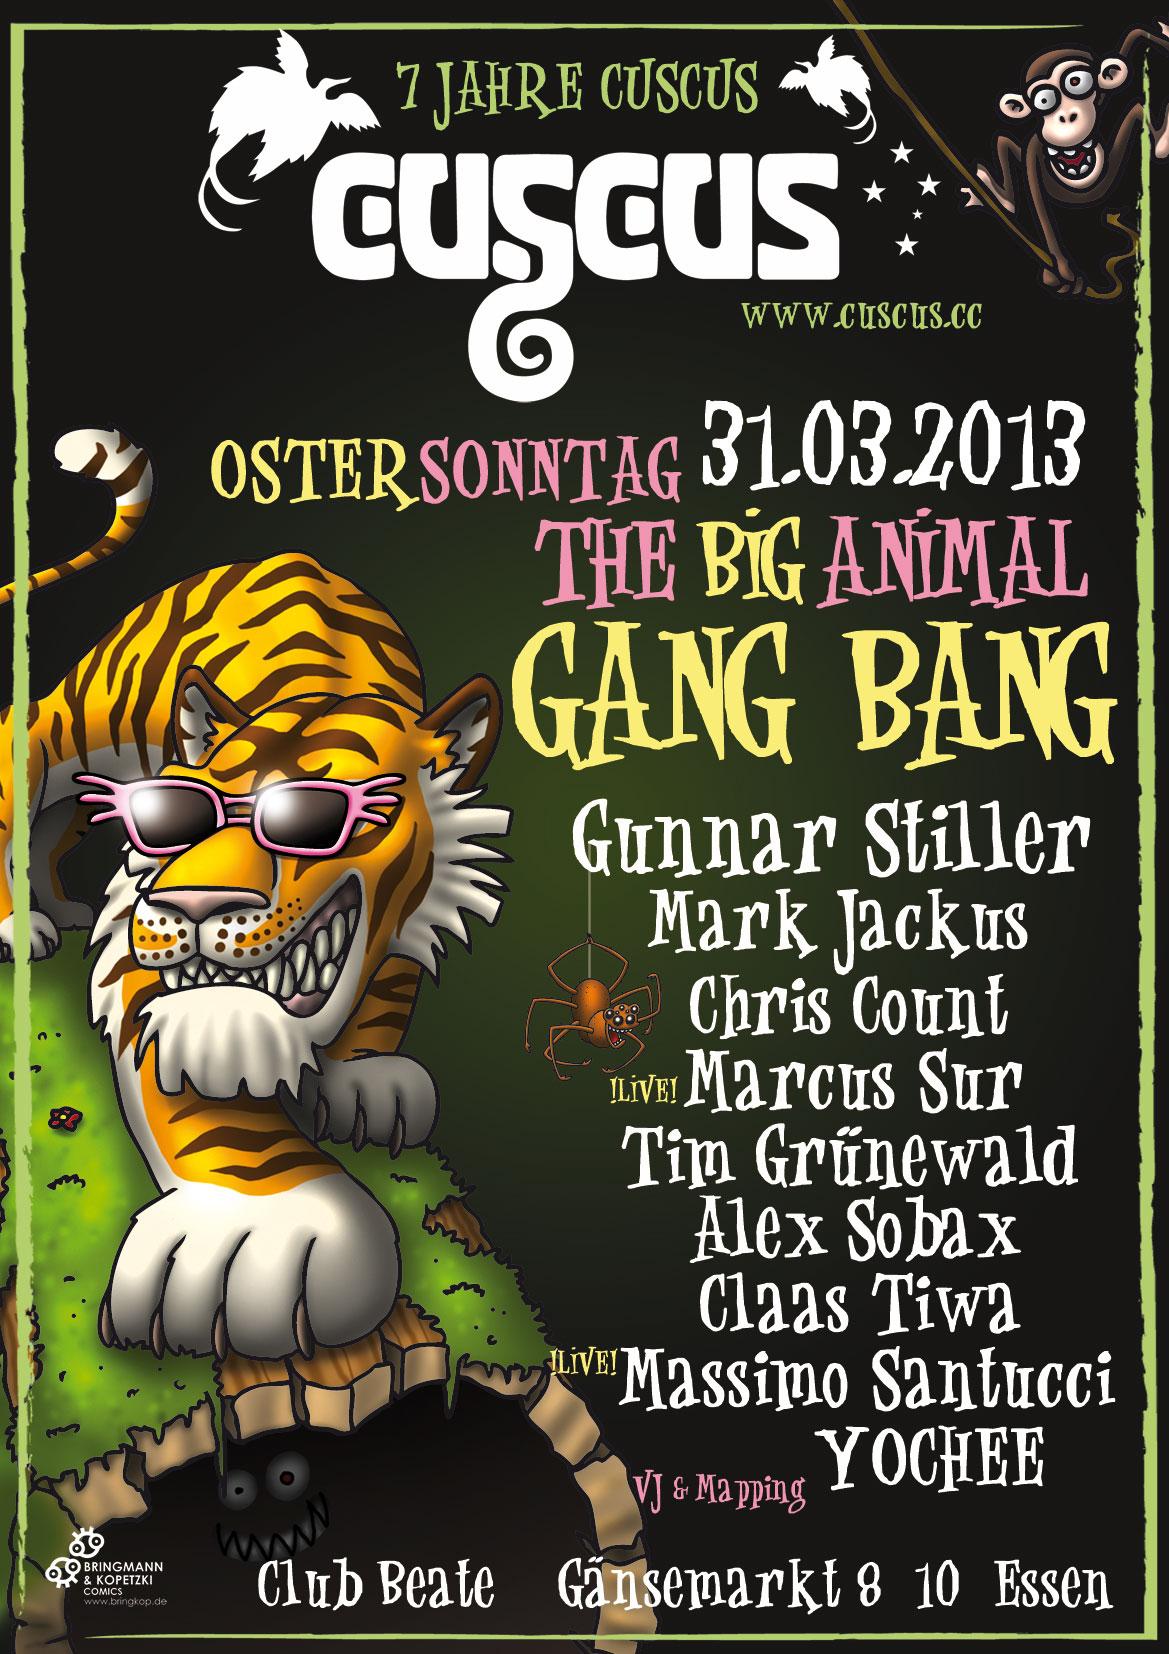 """CusCus 7 Jahres Bday Party"" im Club Beate in Essen"